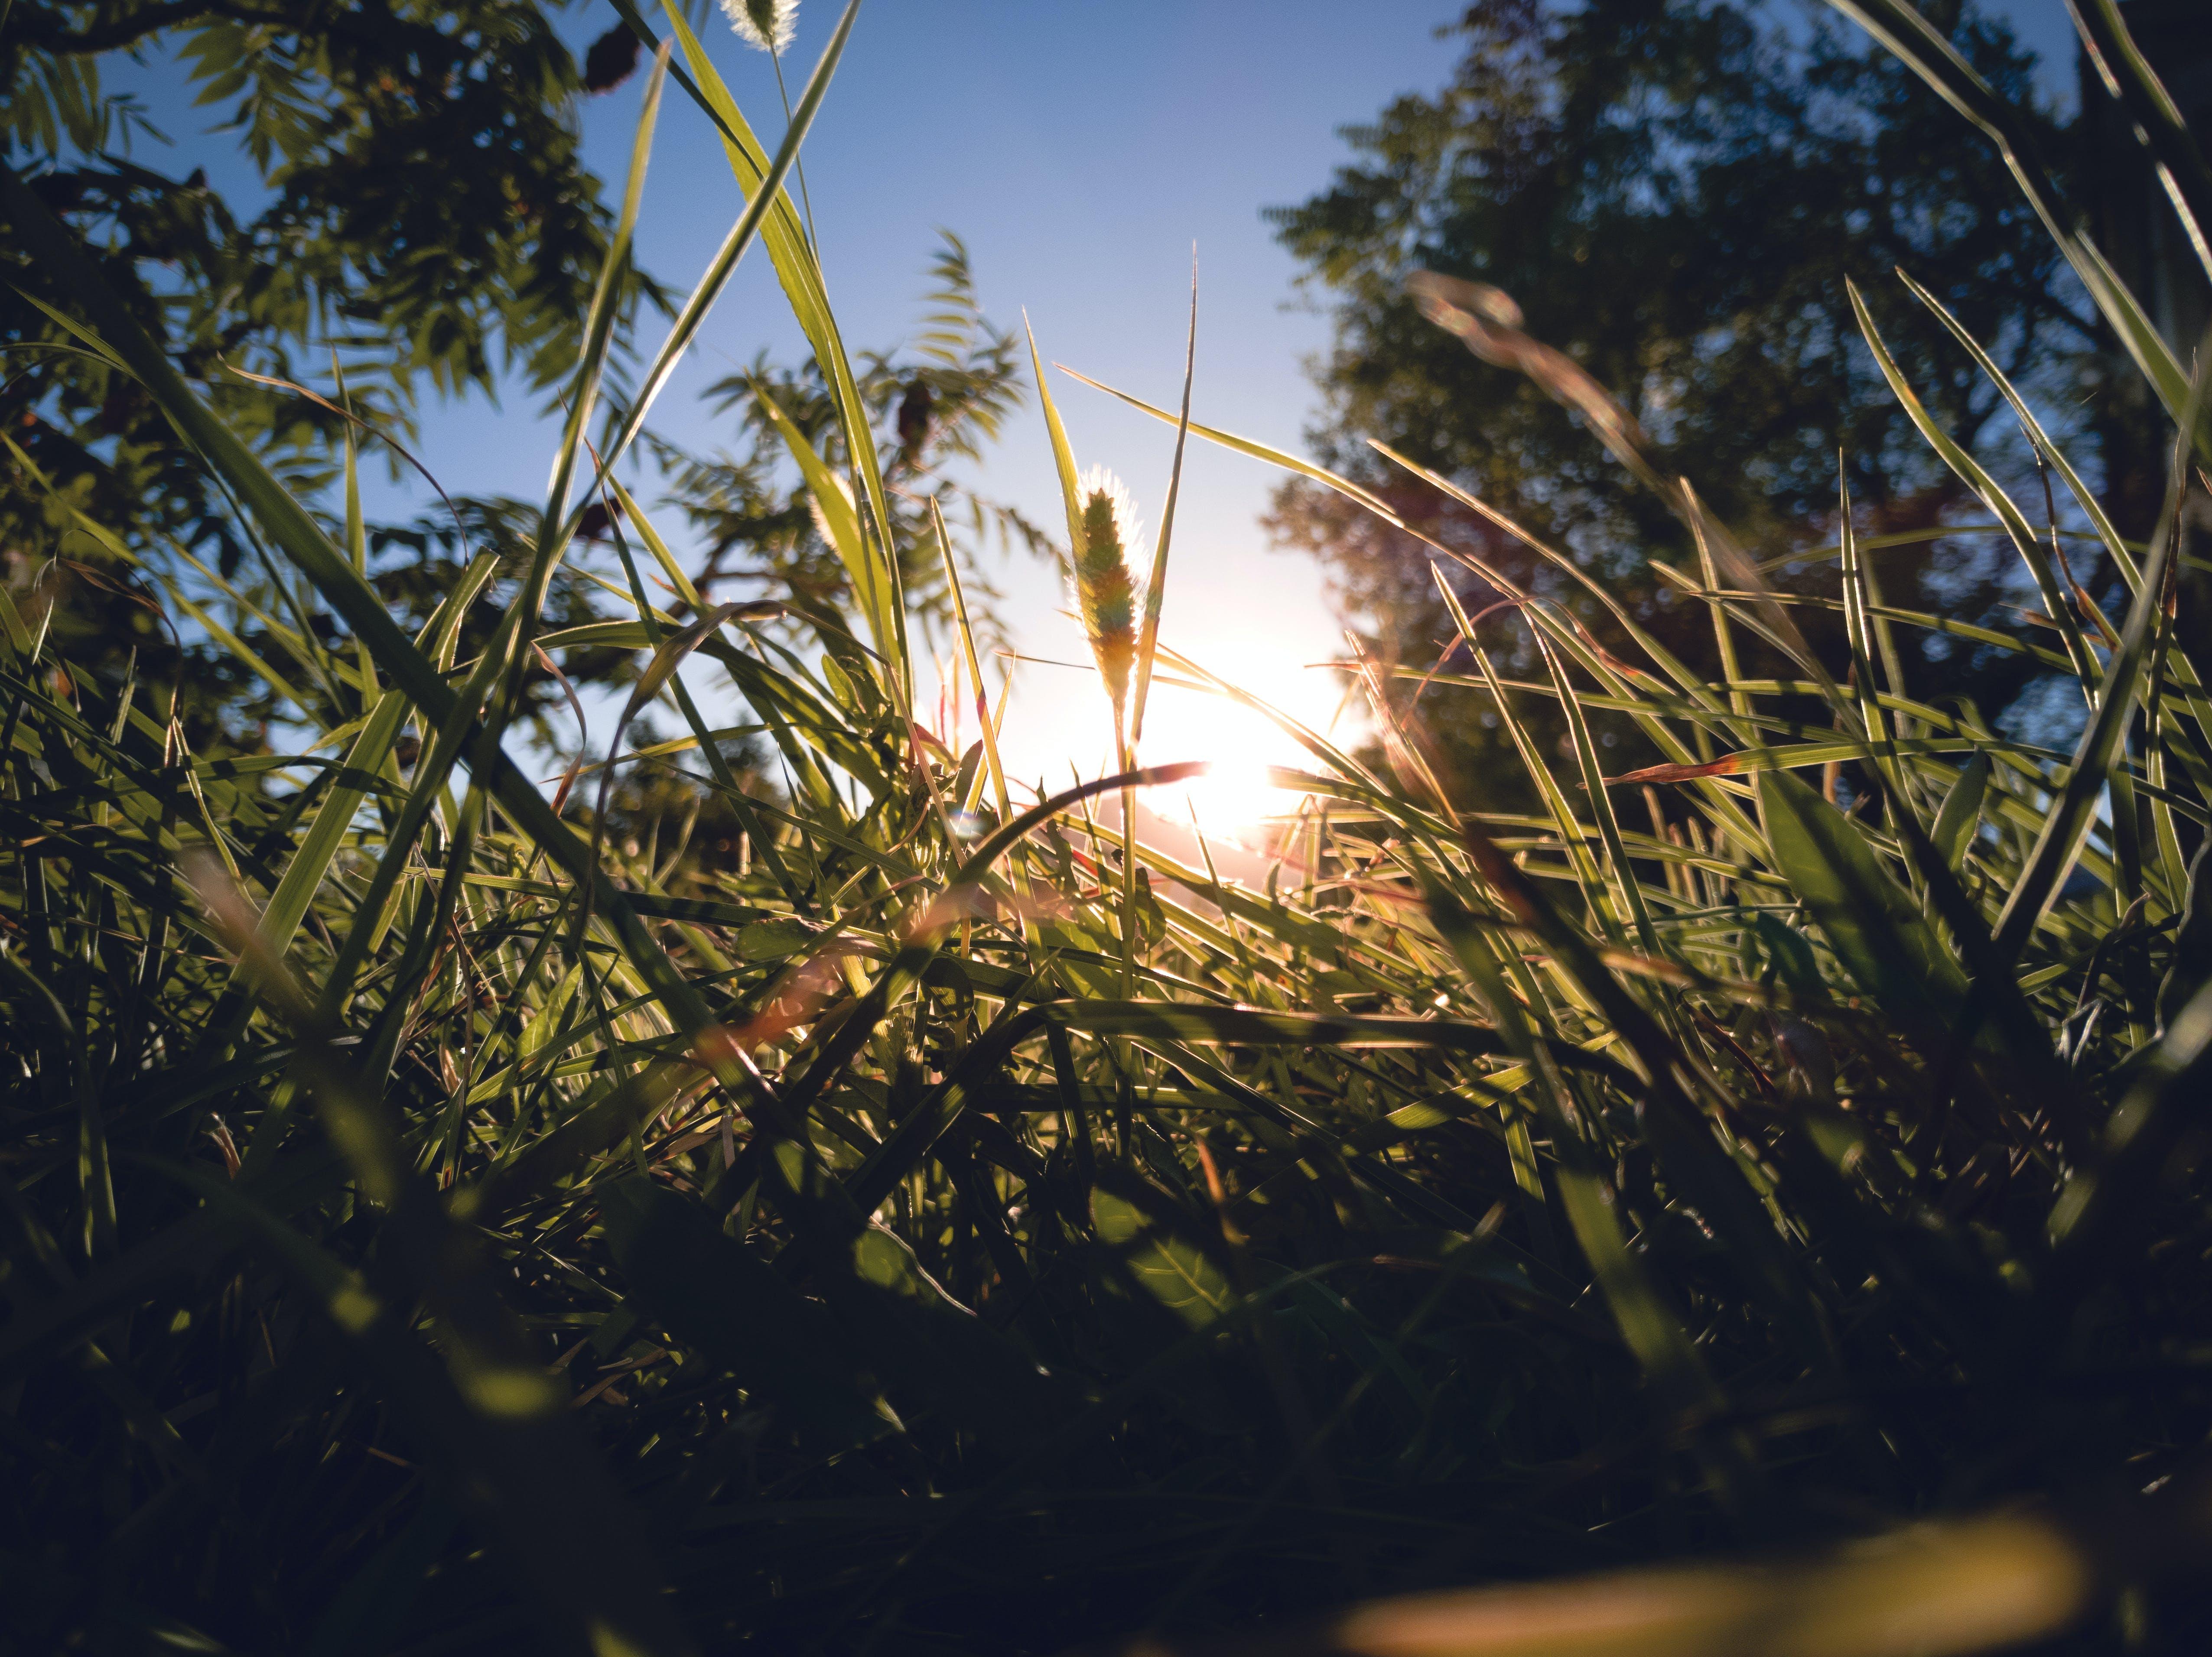 Grass Near Trees